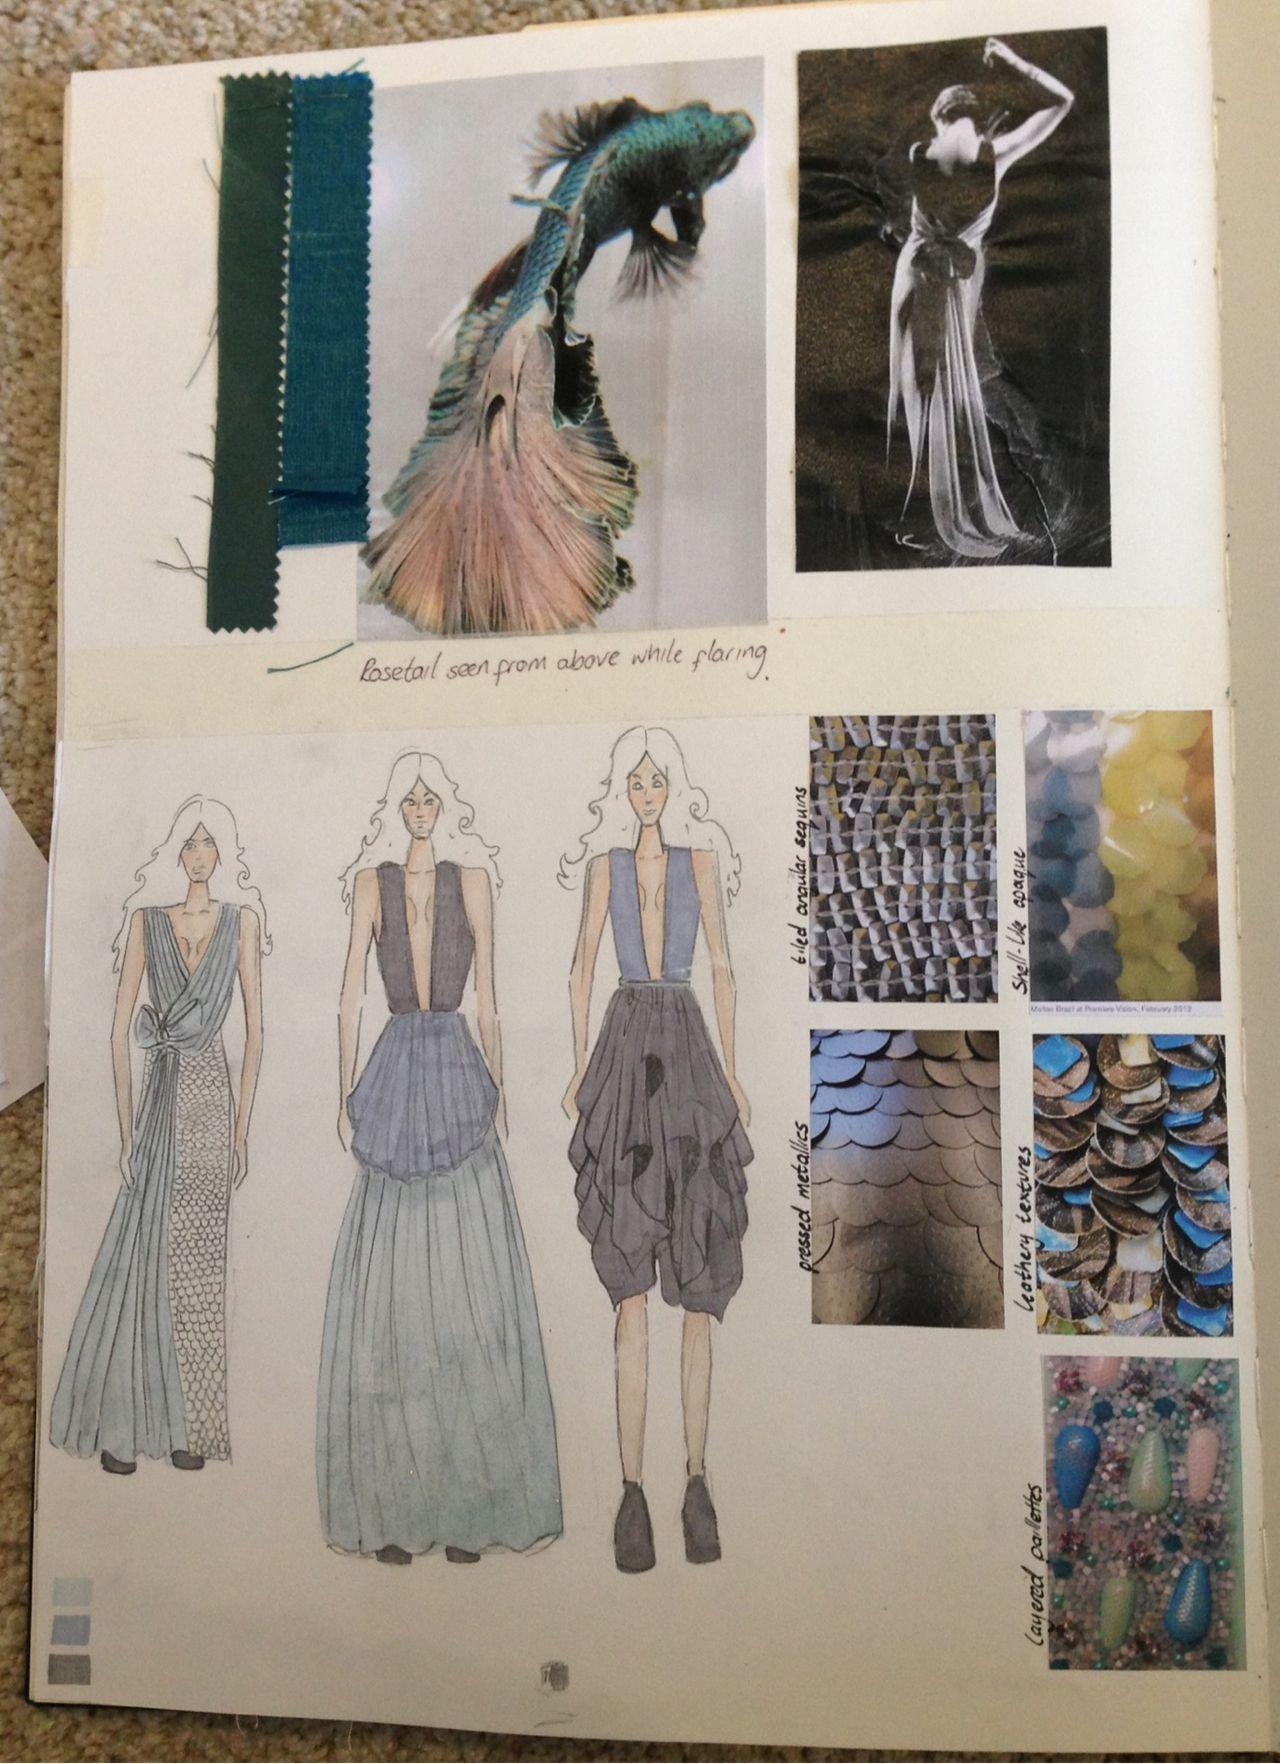 Fashion Sketchbook Fashion Design Drawings Fish Inspirations Fashion Portfolio Fashion Design Drawings Fashion Design Sketchbook Sketch Book